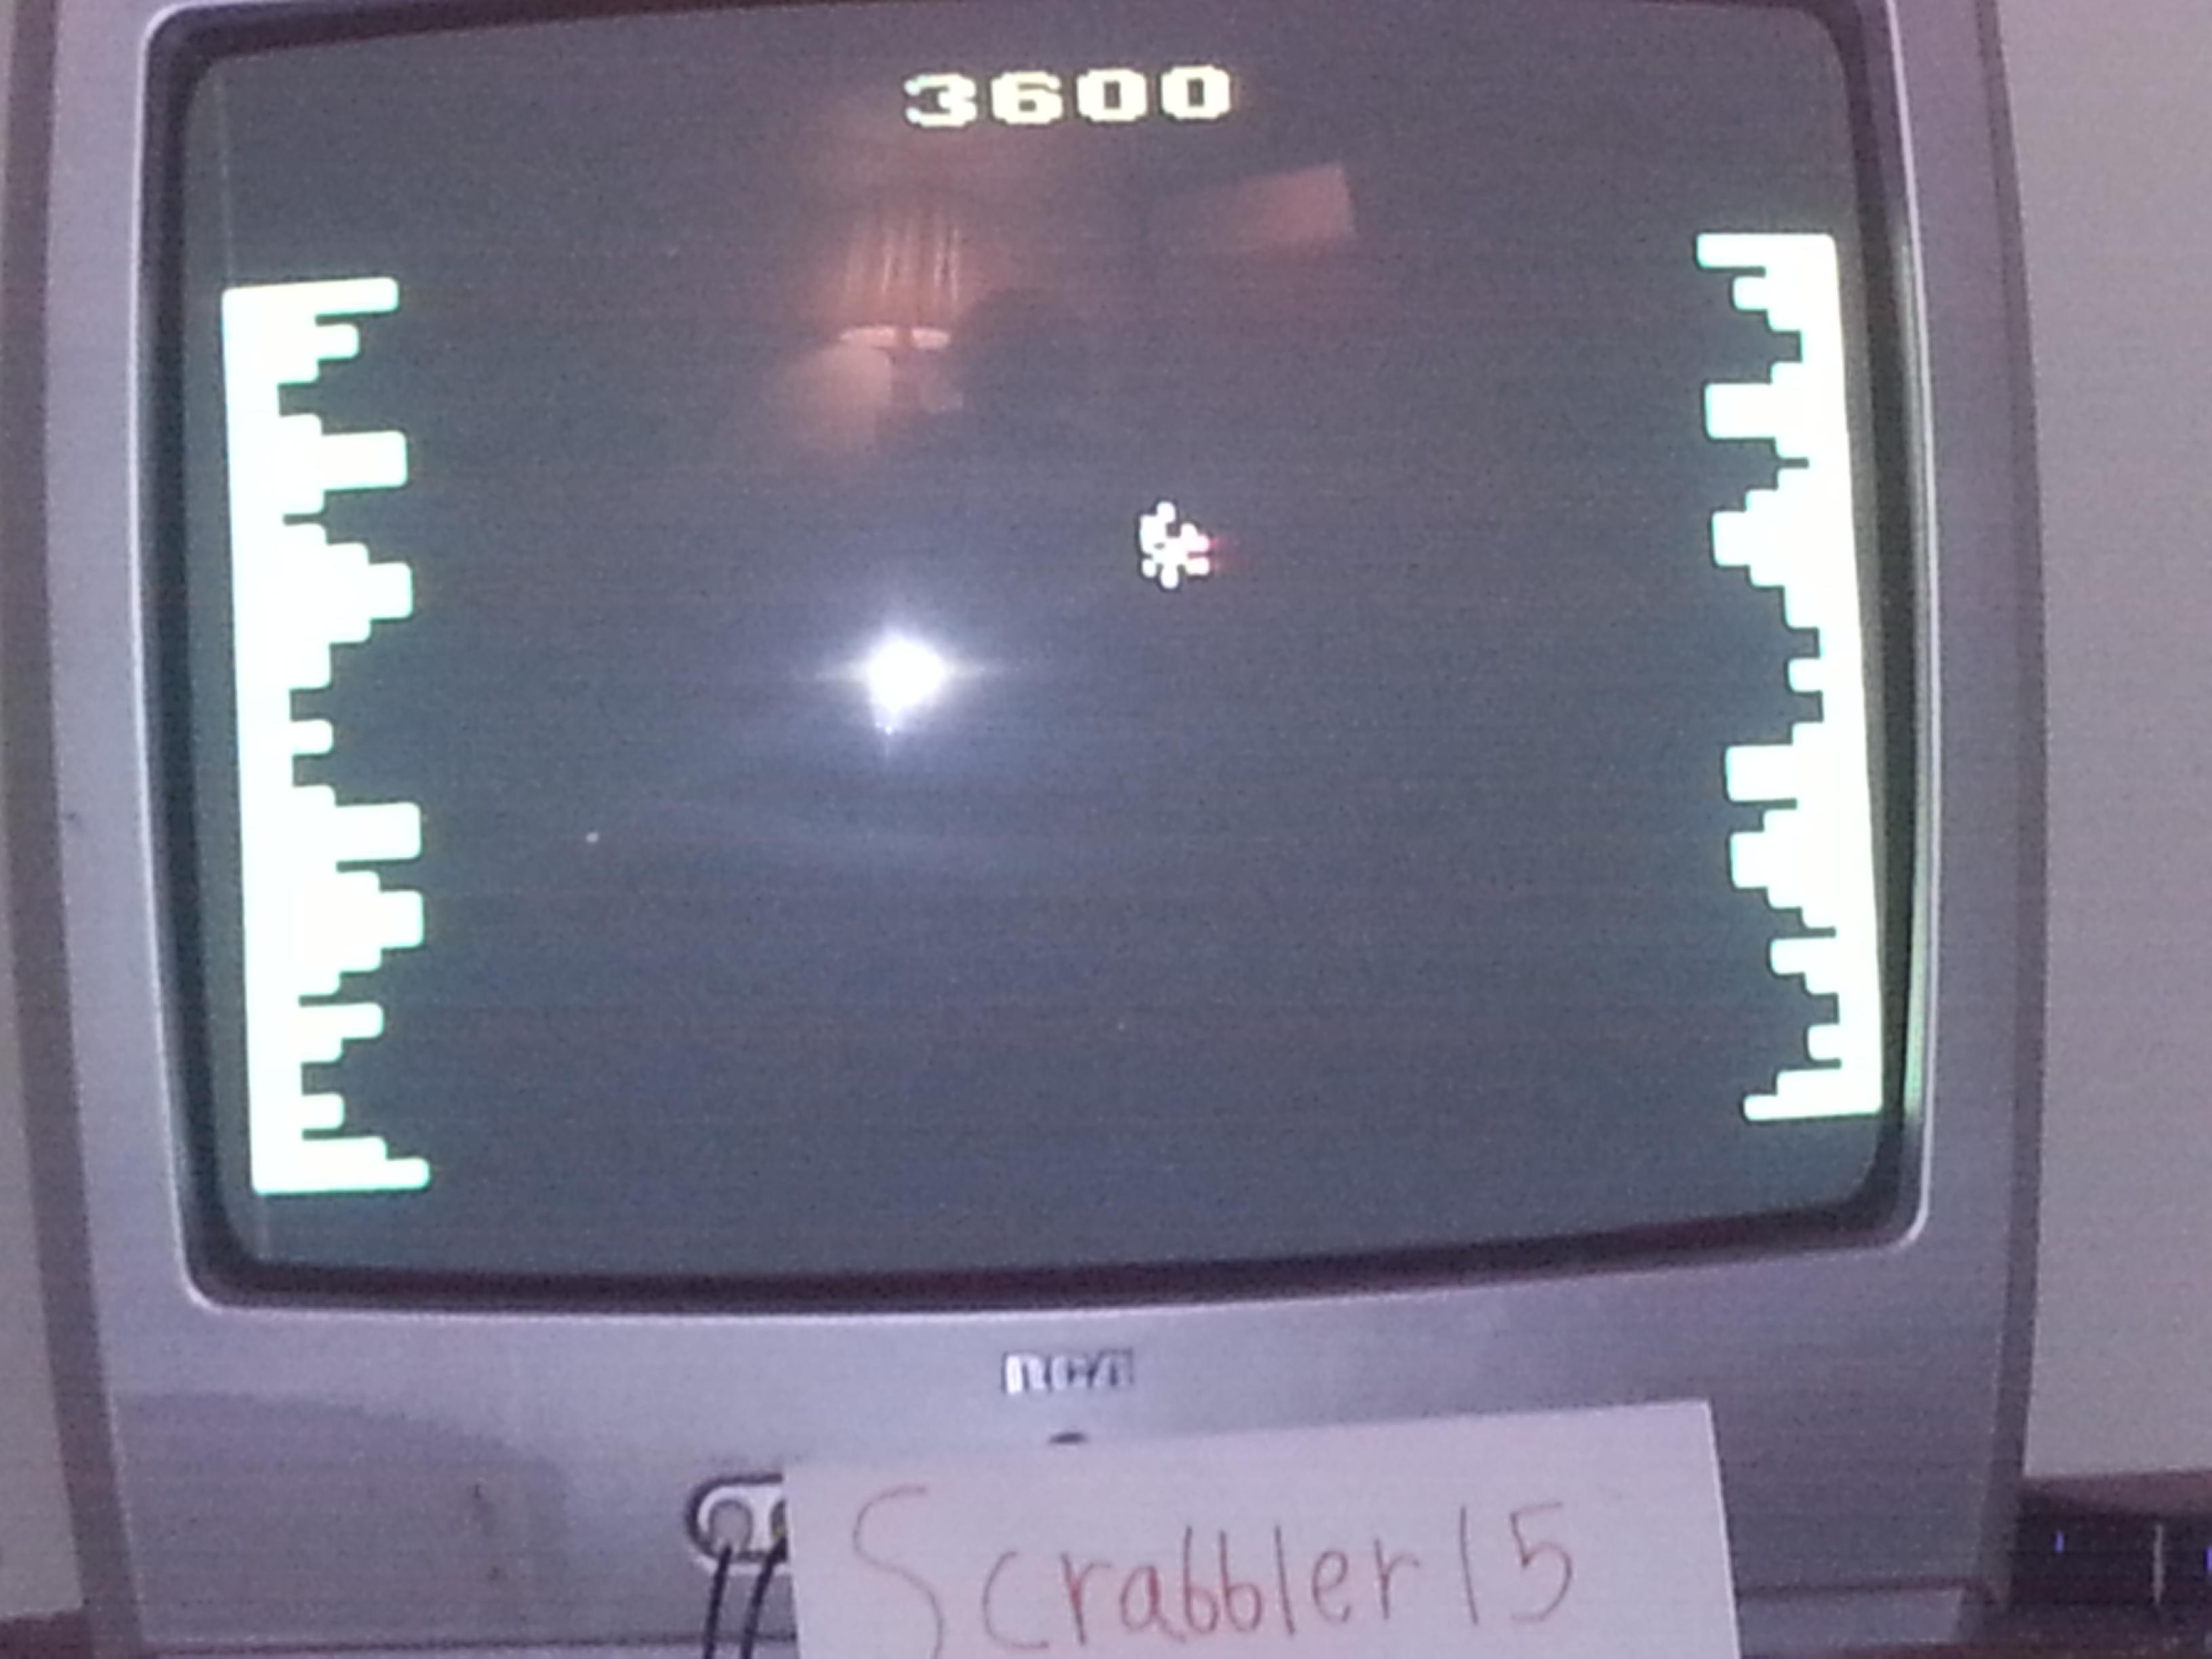 Scrabbler15: Cosmic Corridor (Atari 2600 Novice/B) 3,600 points on 2014-11-15 16:55:31